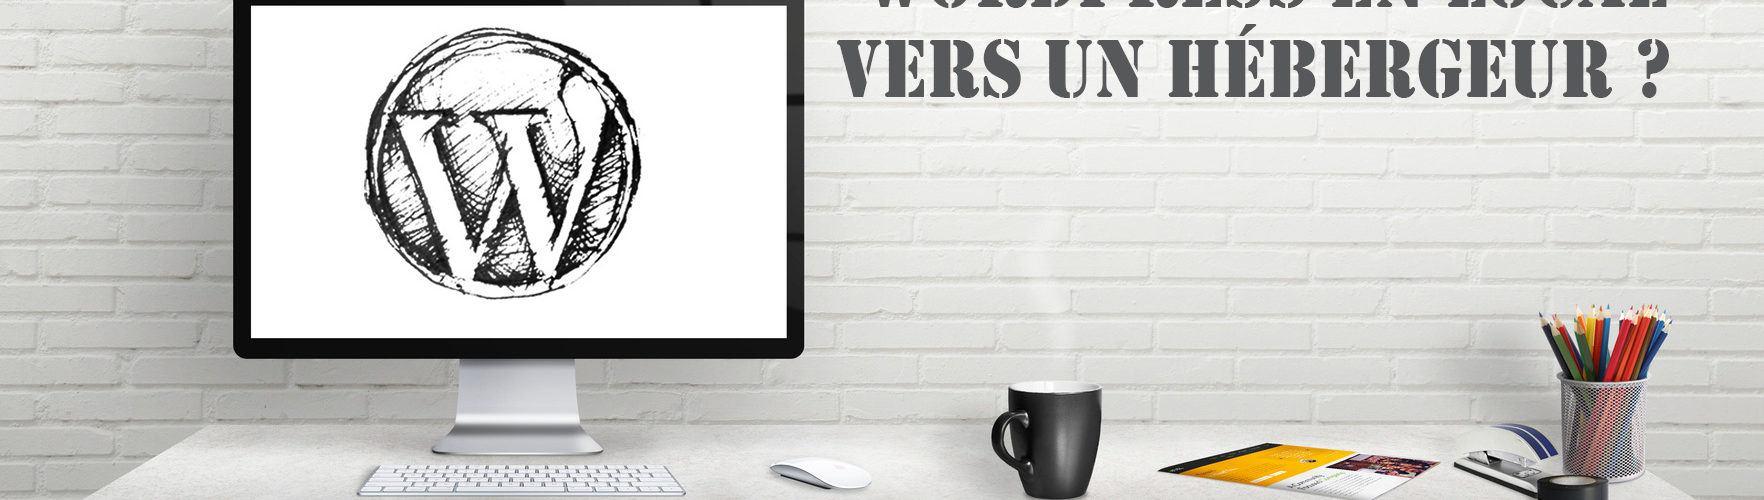 wordpress-local-hebergeur